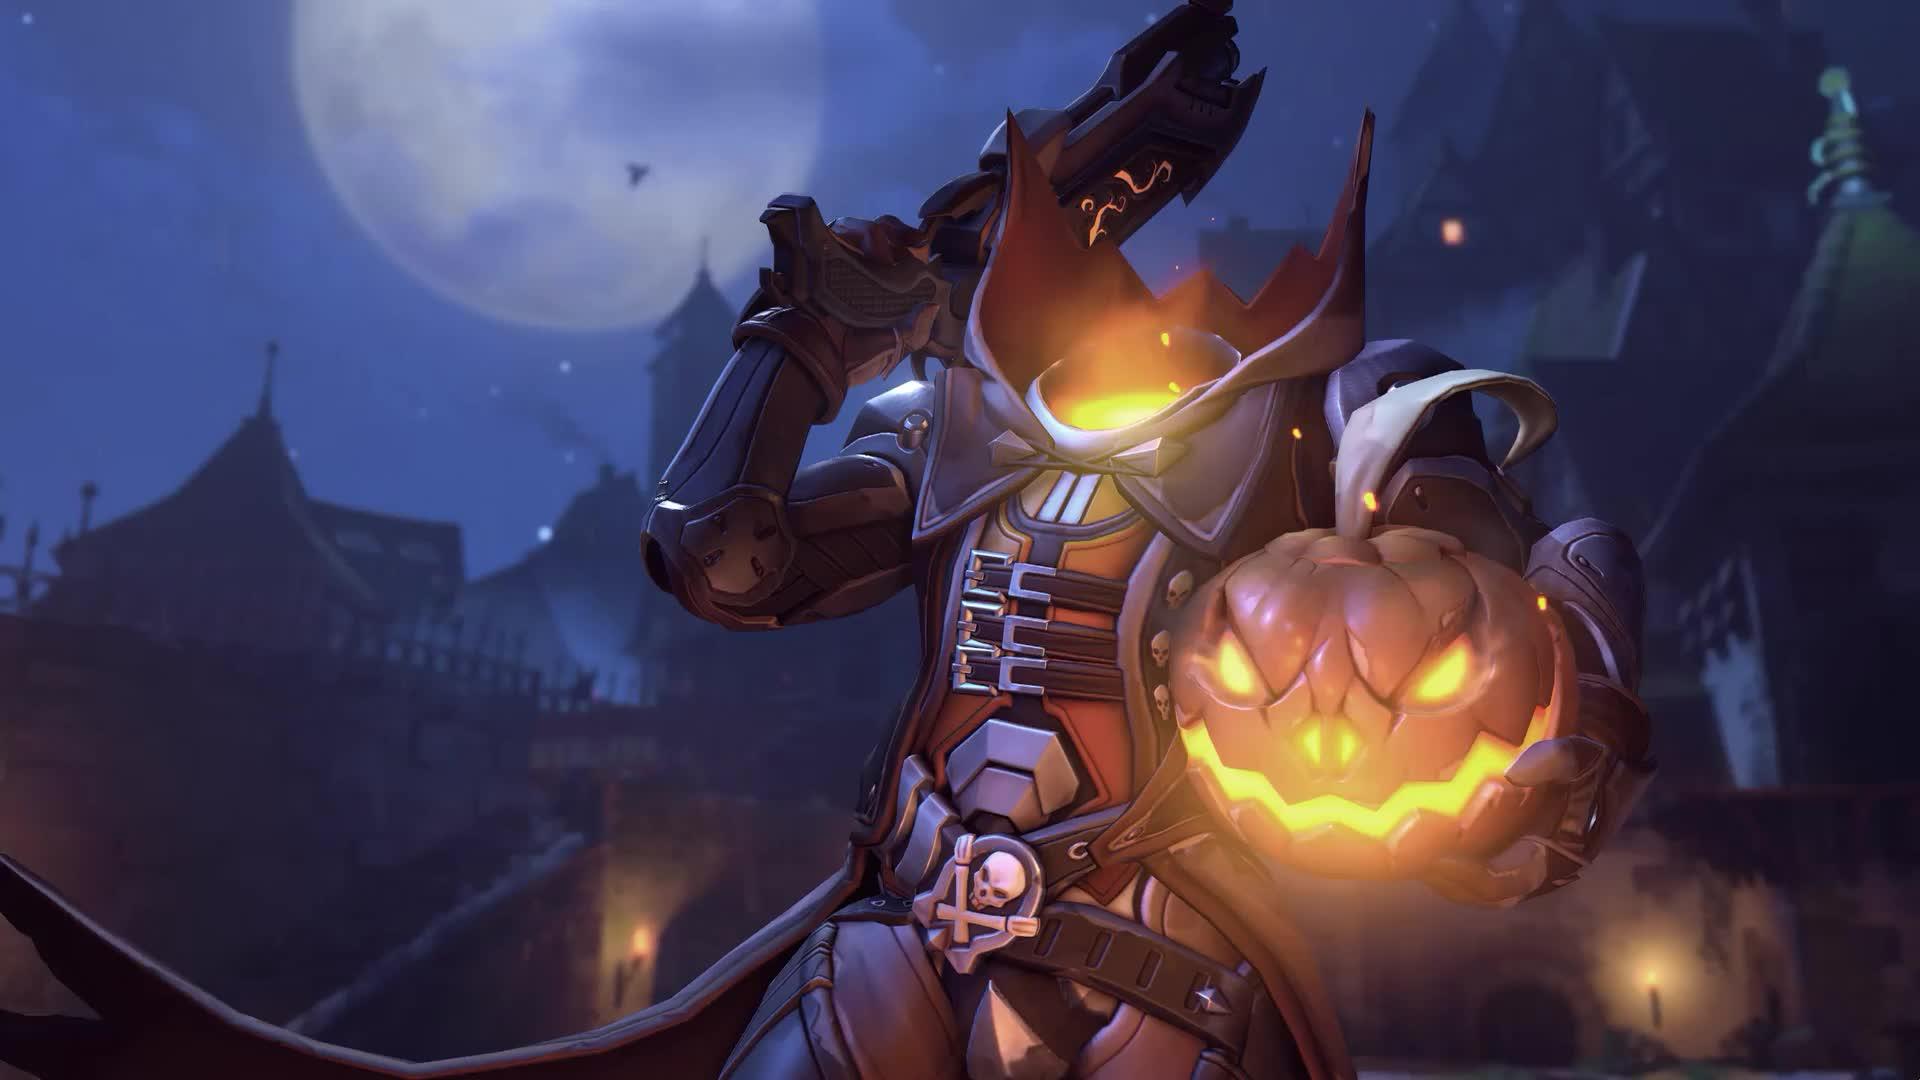 Reaper или Жнец Halloween Overwatch - живые обои